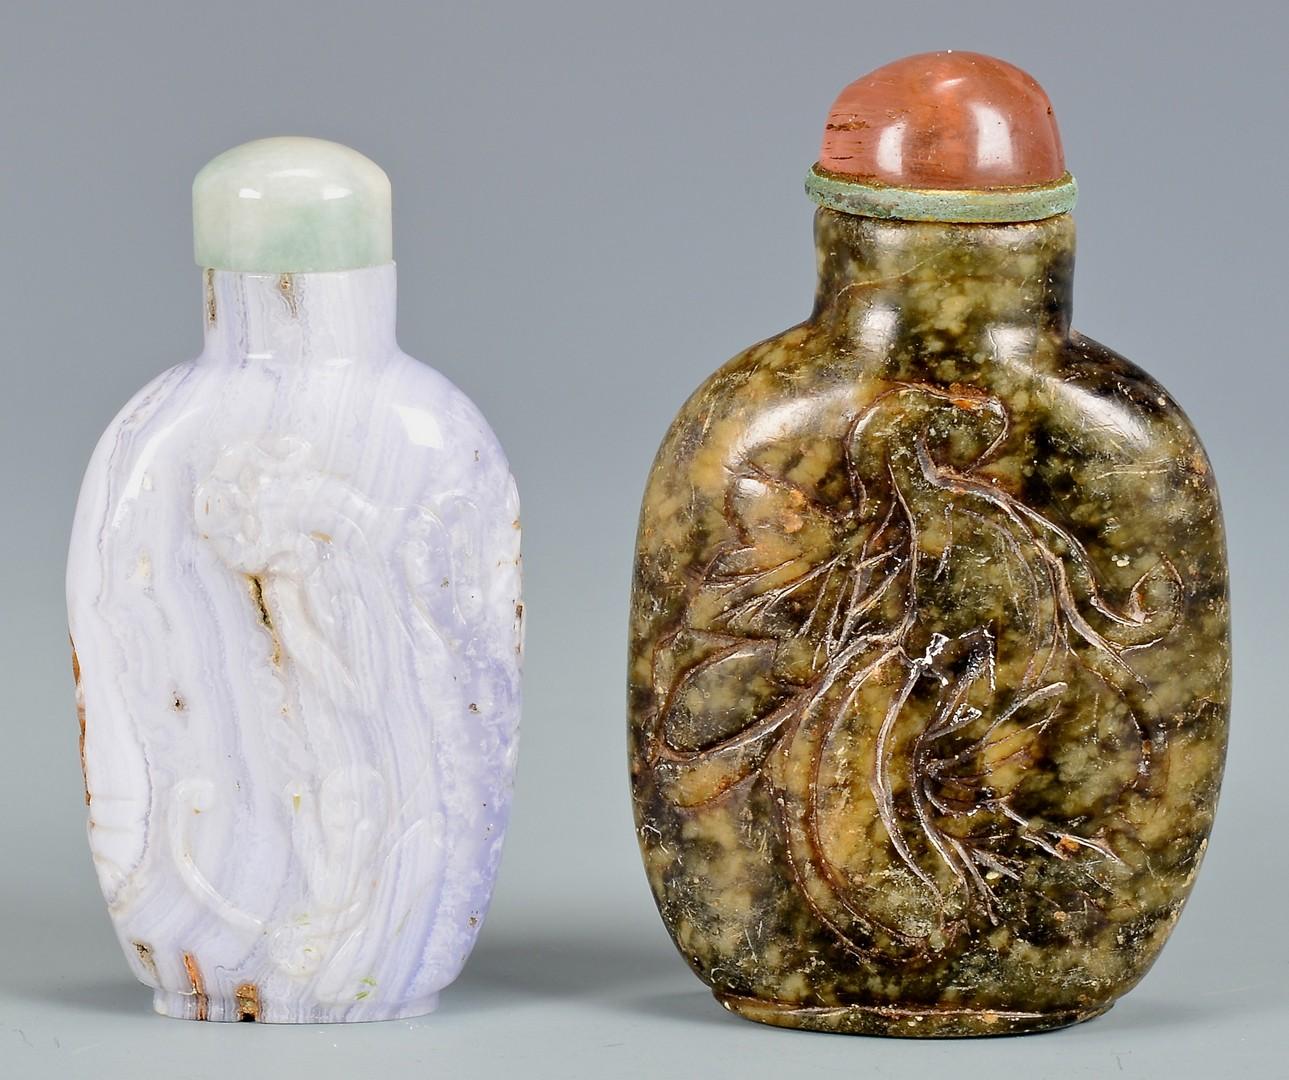 Lot 1: 3 Chinese Snuff Bottles inc. Cicada